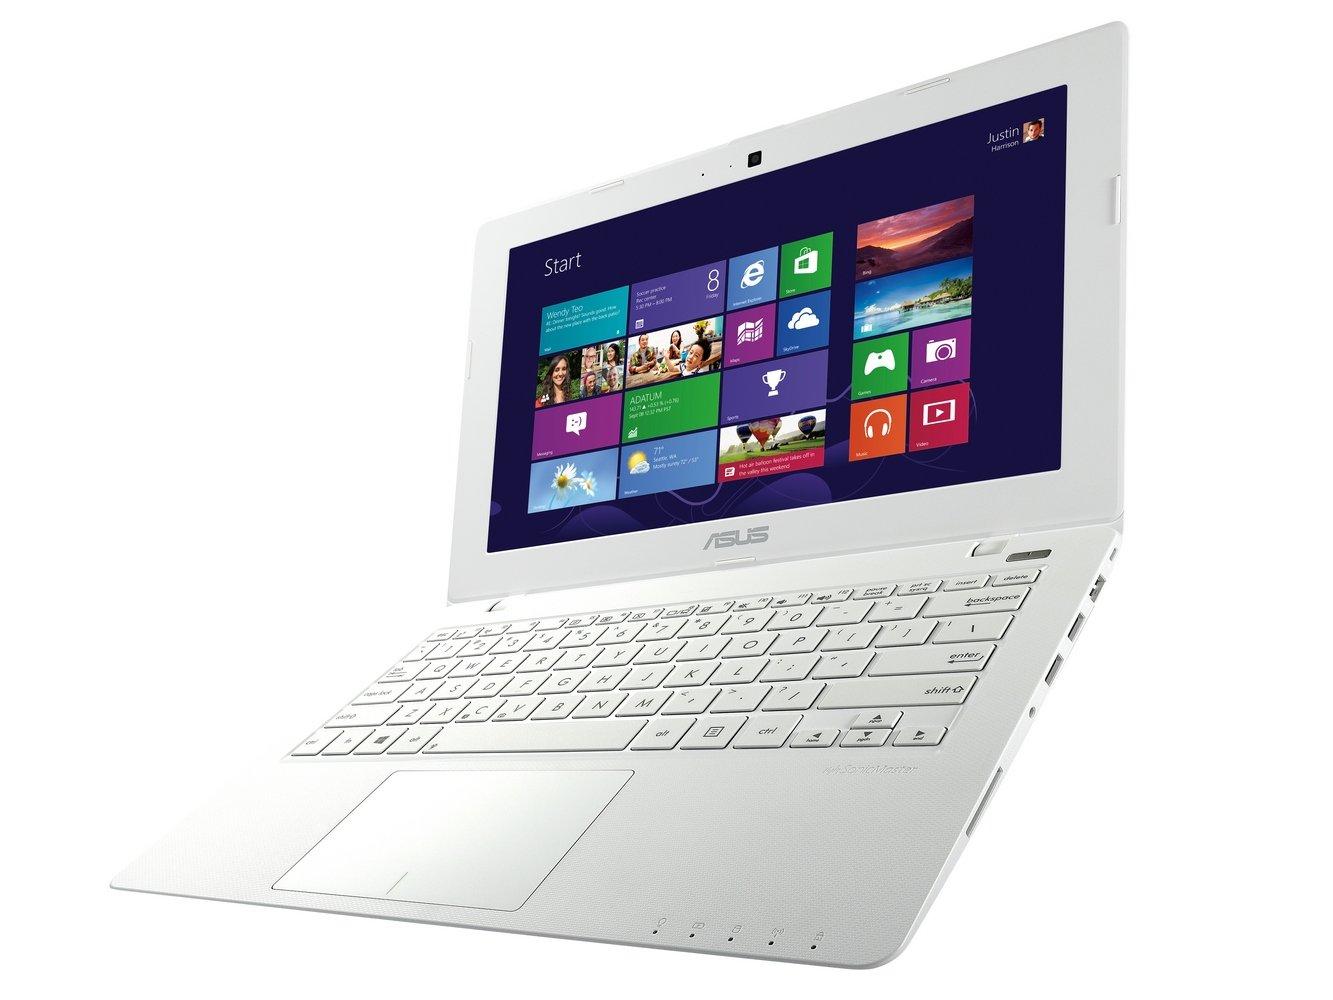 ASUS X200MA NB / WHITE ( Win8.1 64bit / 11.6inch / Celeron N2830 / 4G / 750GB HDD ) X200MA-KXWHITE